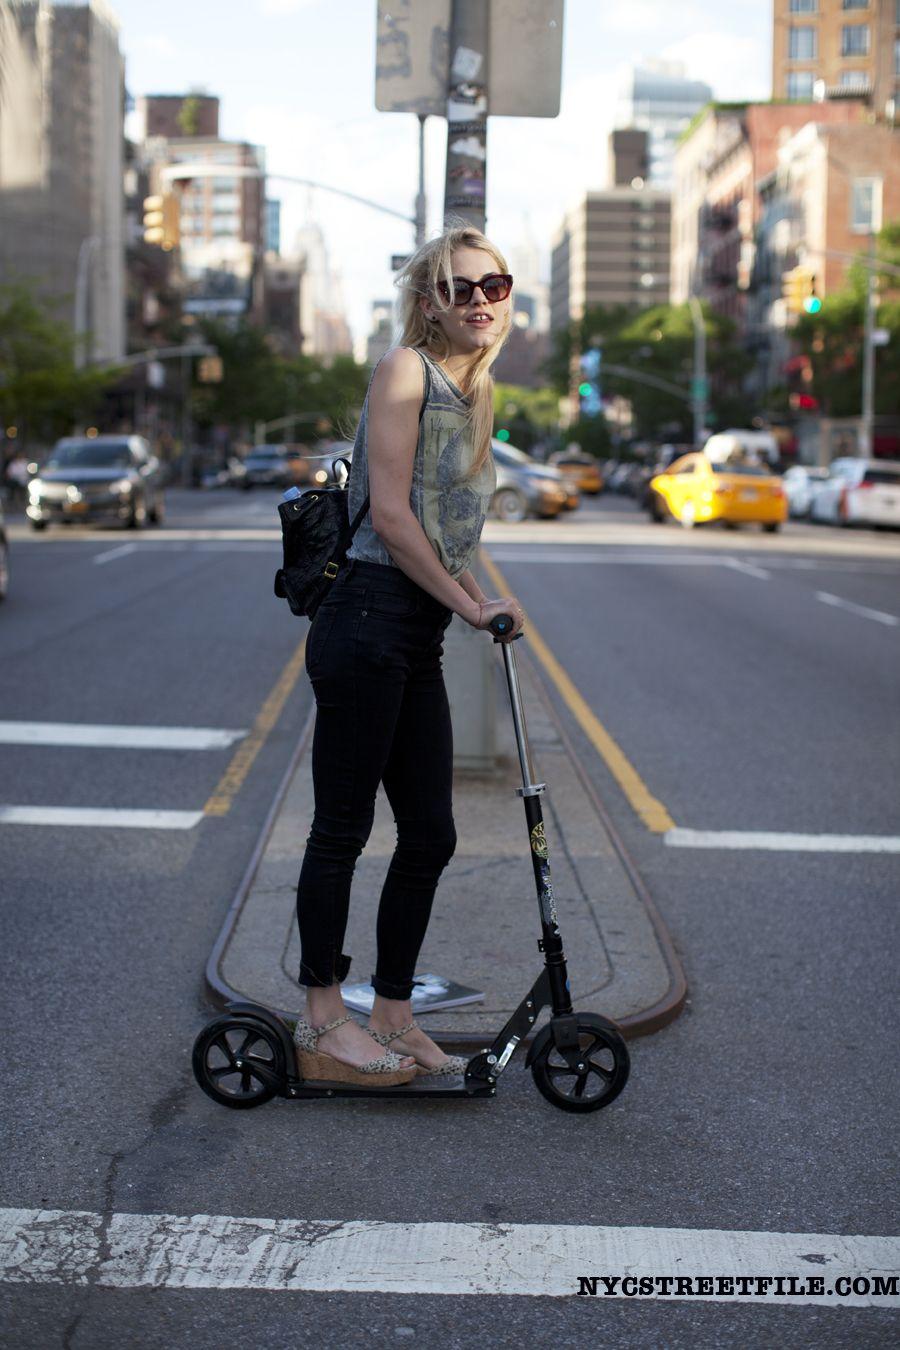 #AshleySmith scooting around #offduty in NYC.